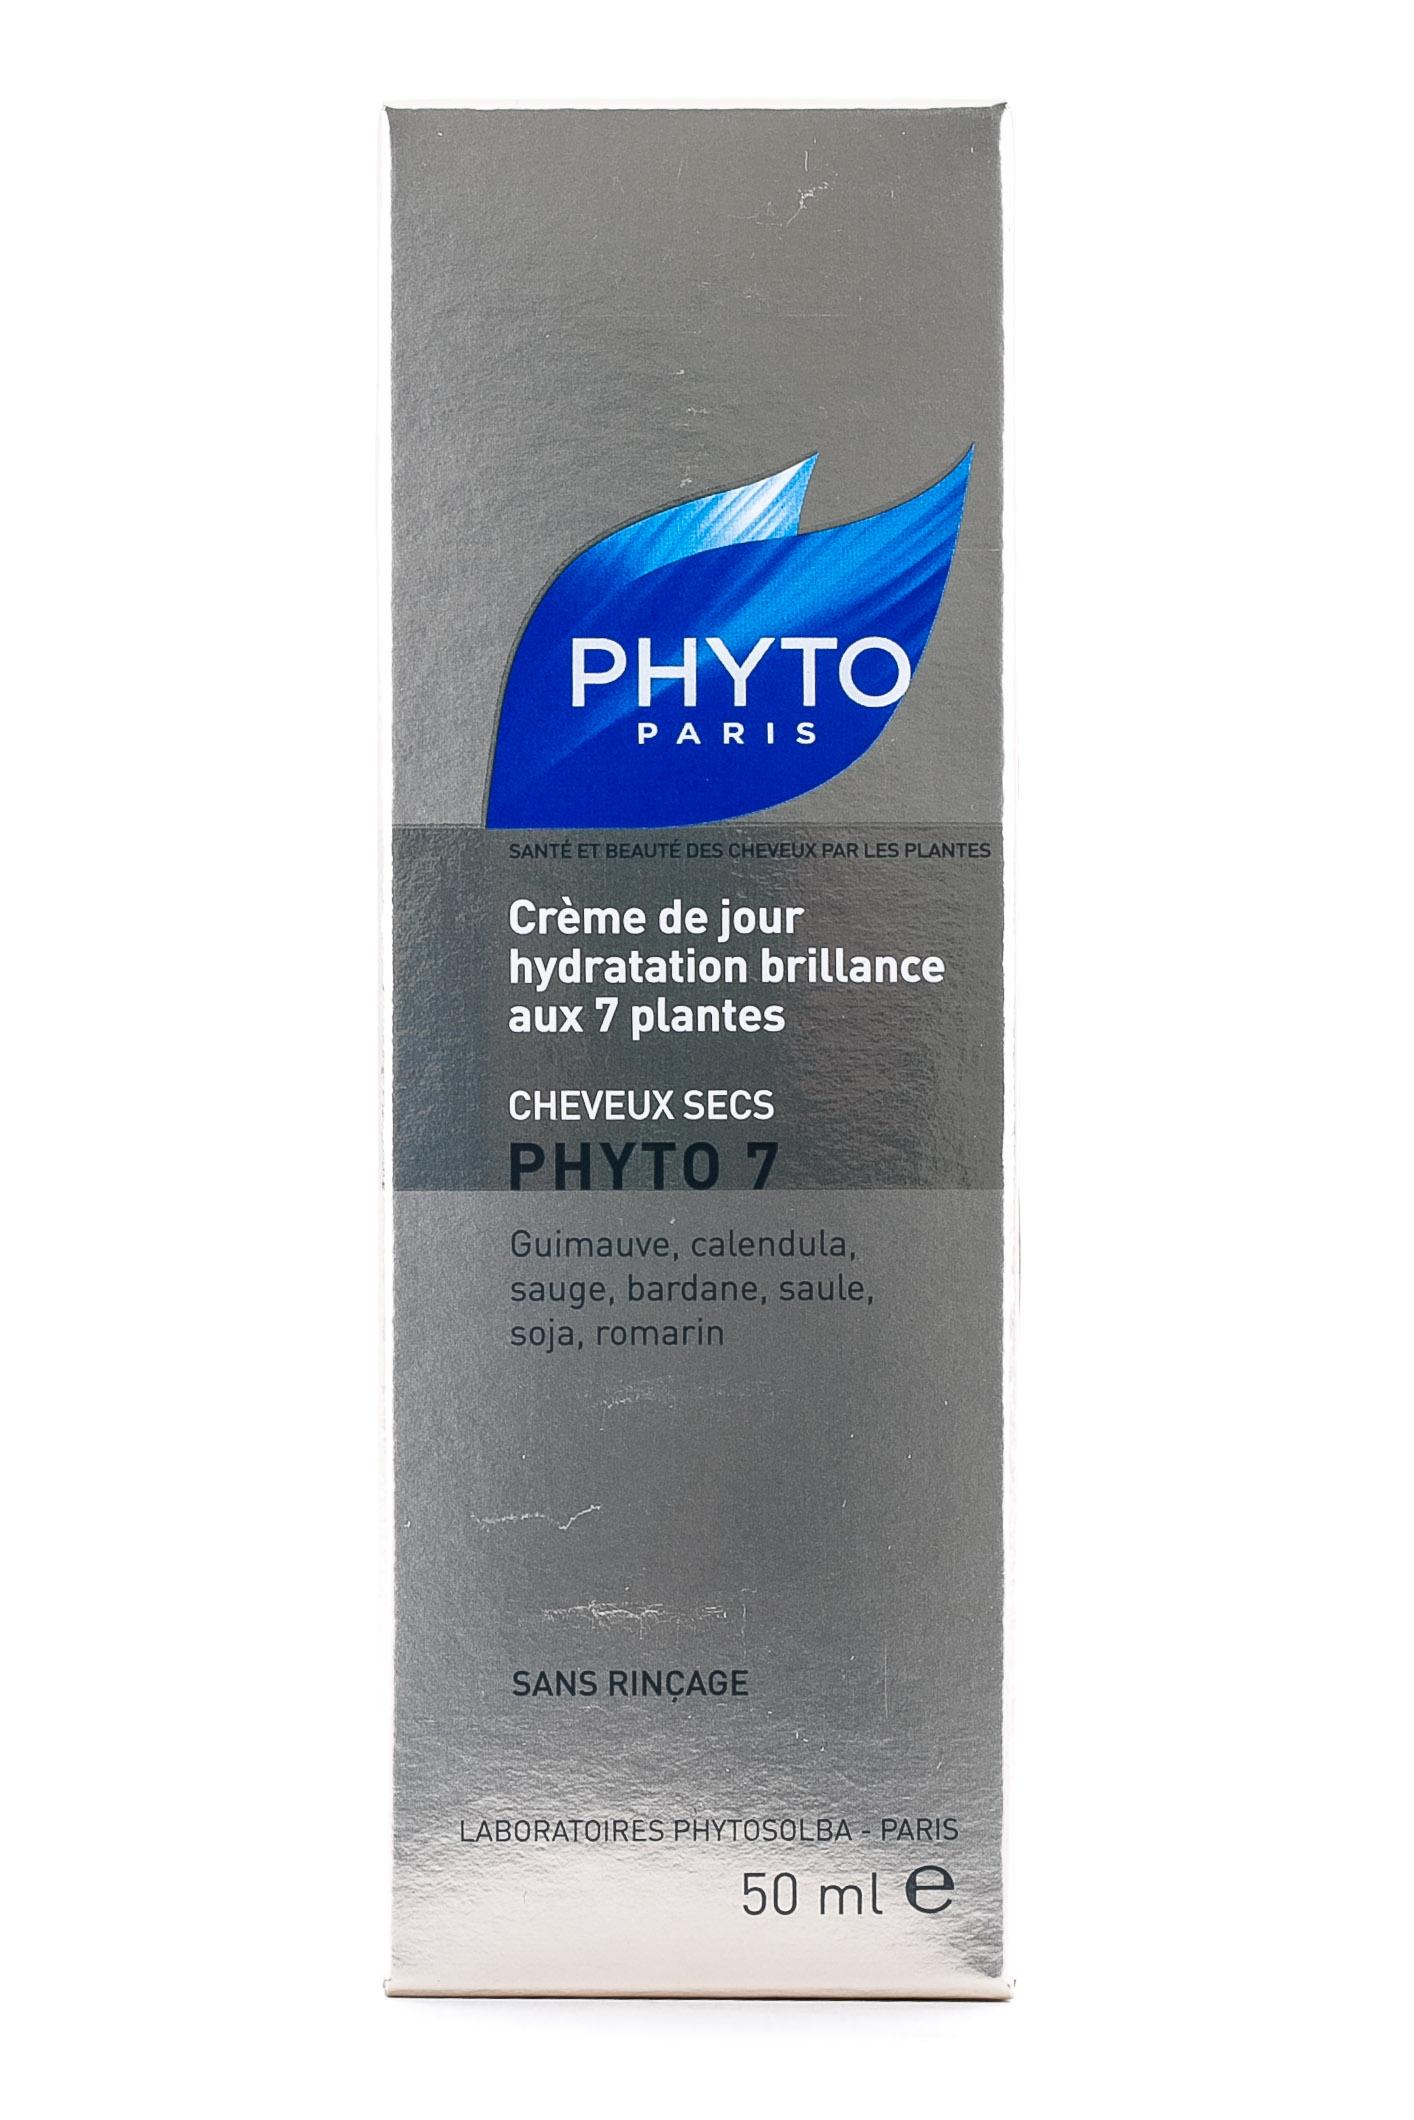 Phytosolba Увлажняющий крем, 50 мл (Phytosolba) недорого